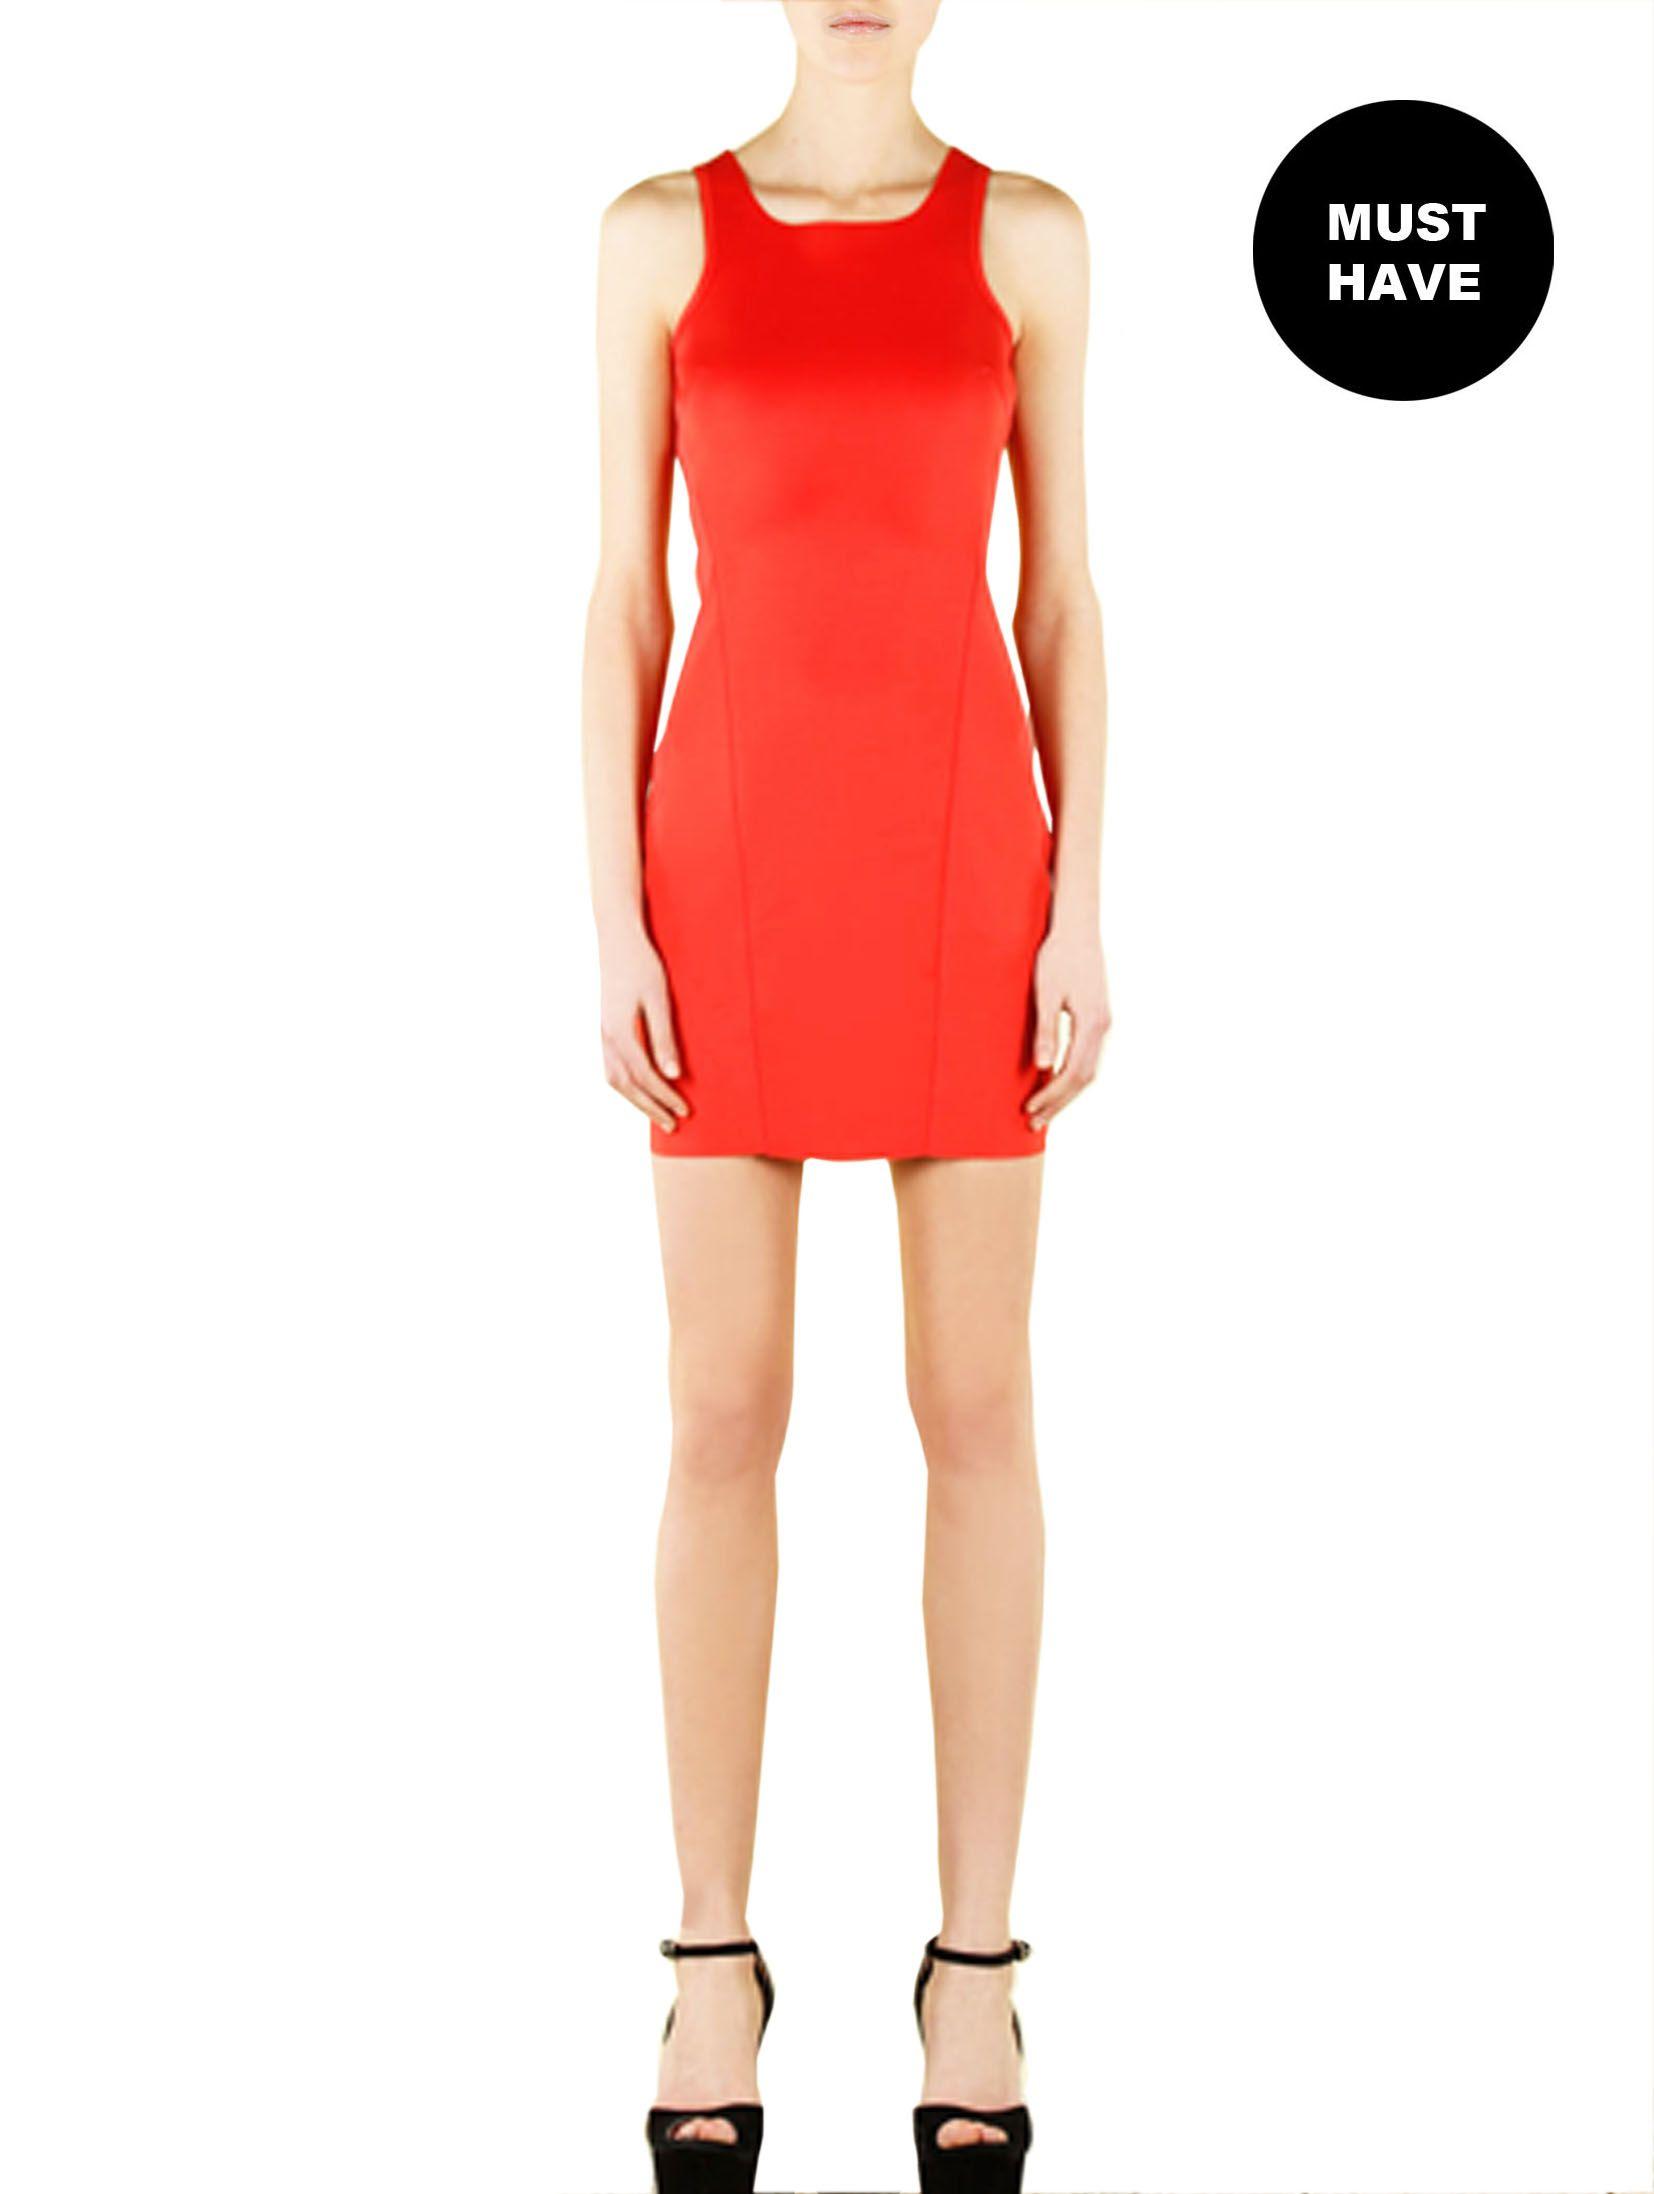 Strawberry love in these Neoprene short dress!